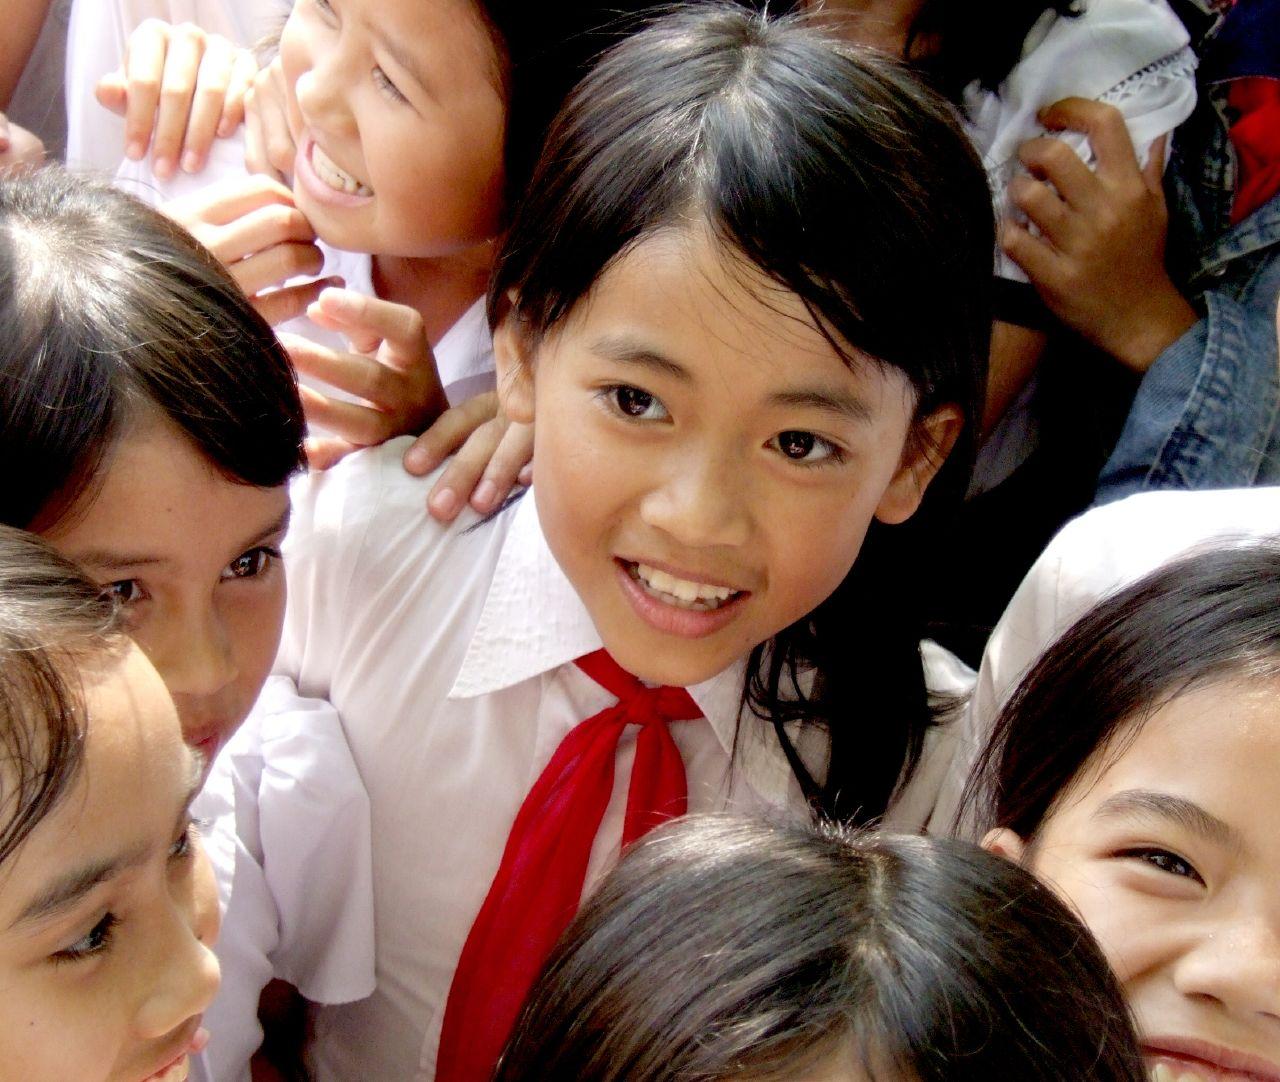 Description Da Nang Girl's Smile.jpg